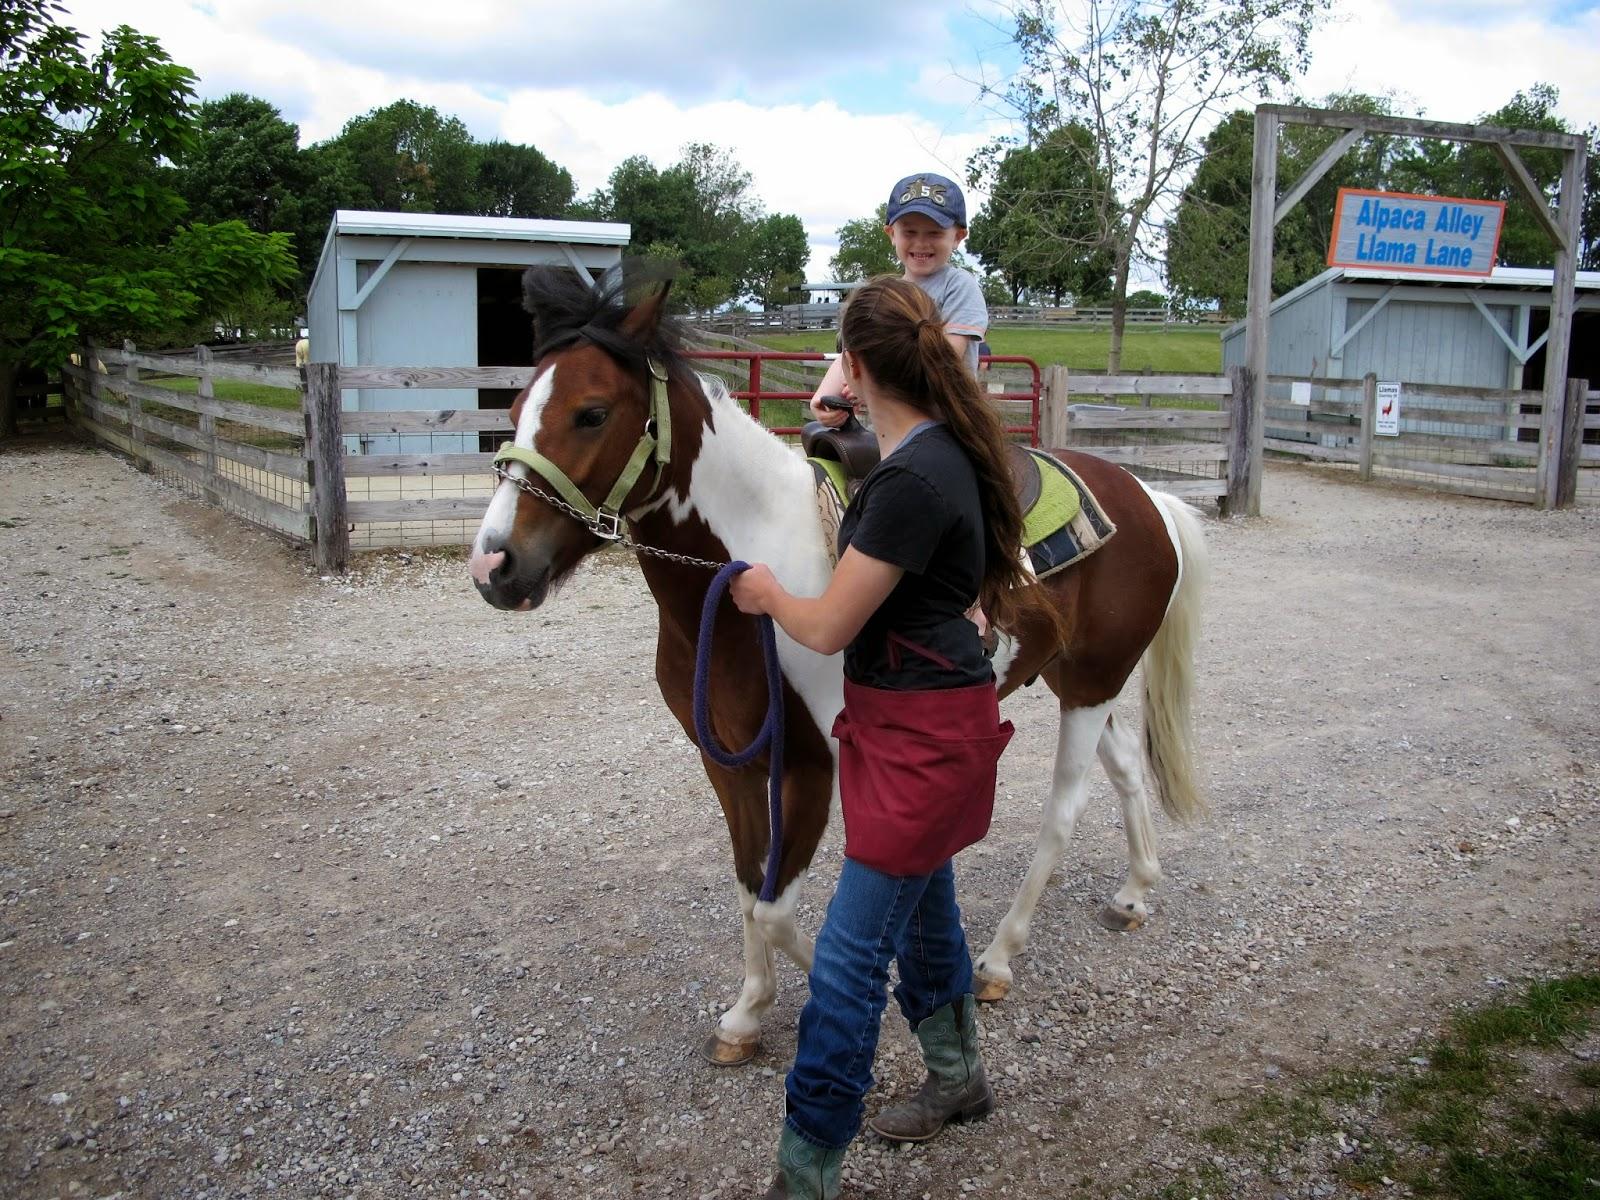 Porter on a Pony